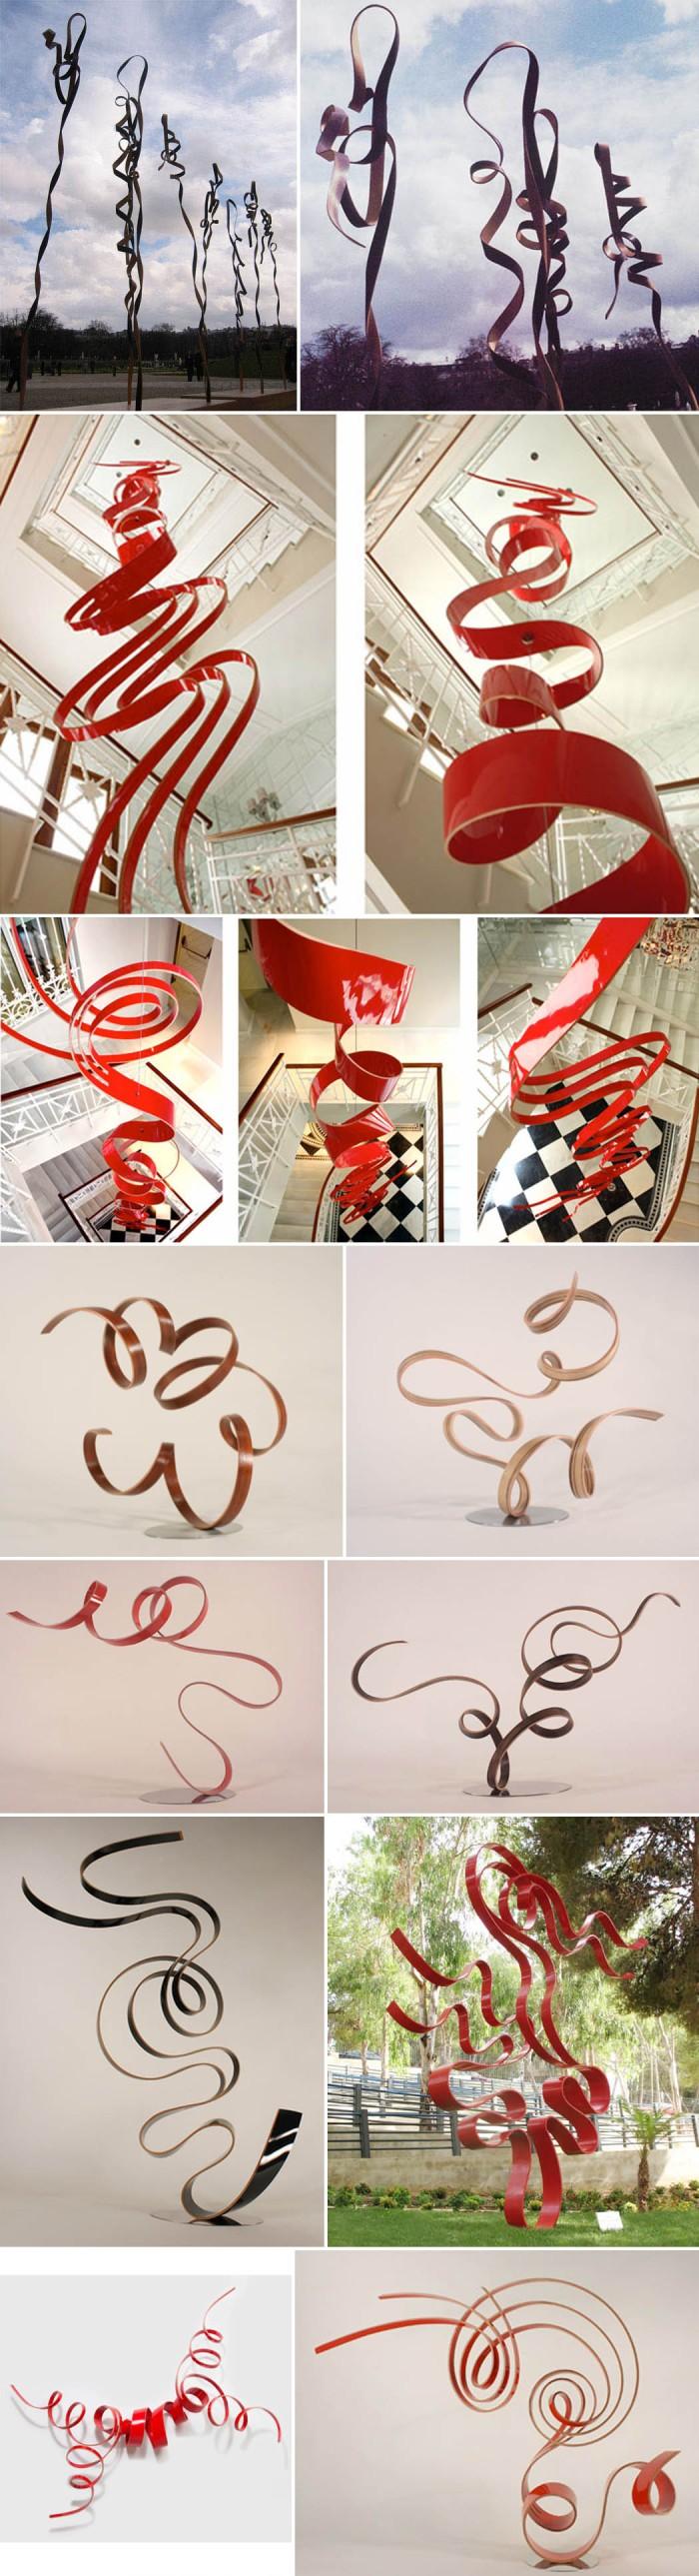 art, sculpture, wood curves, spanish sculptor